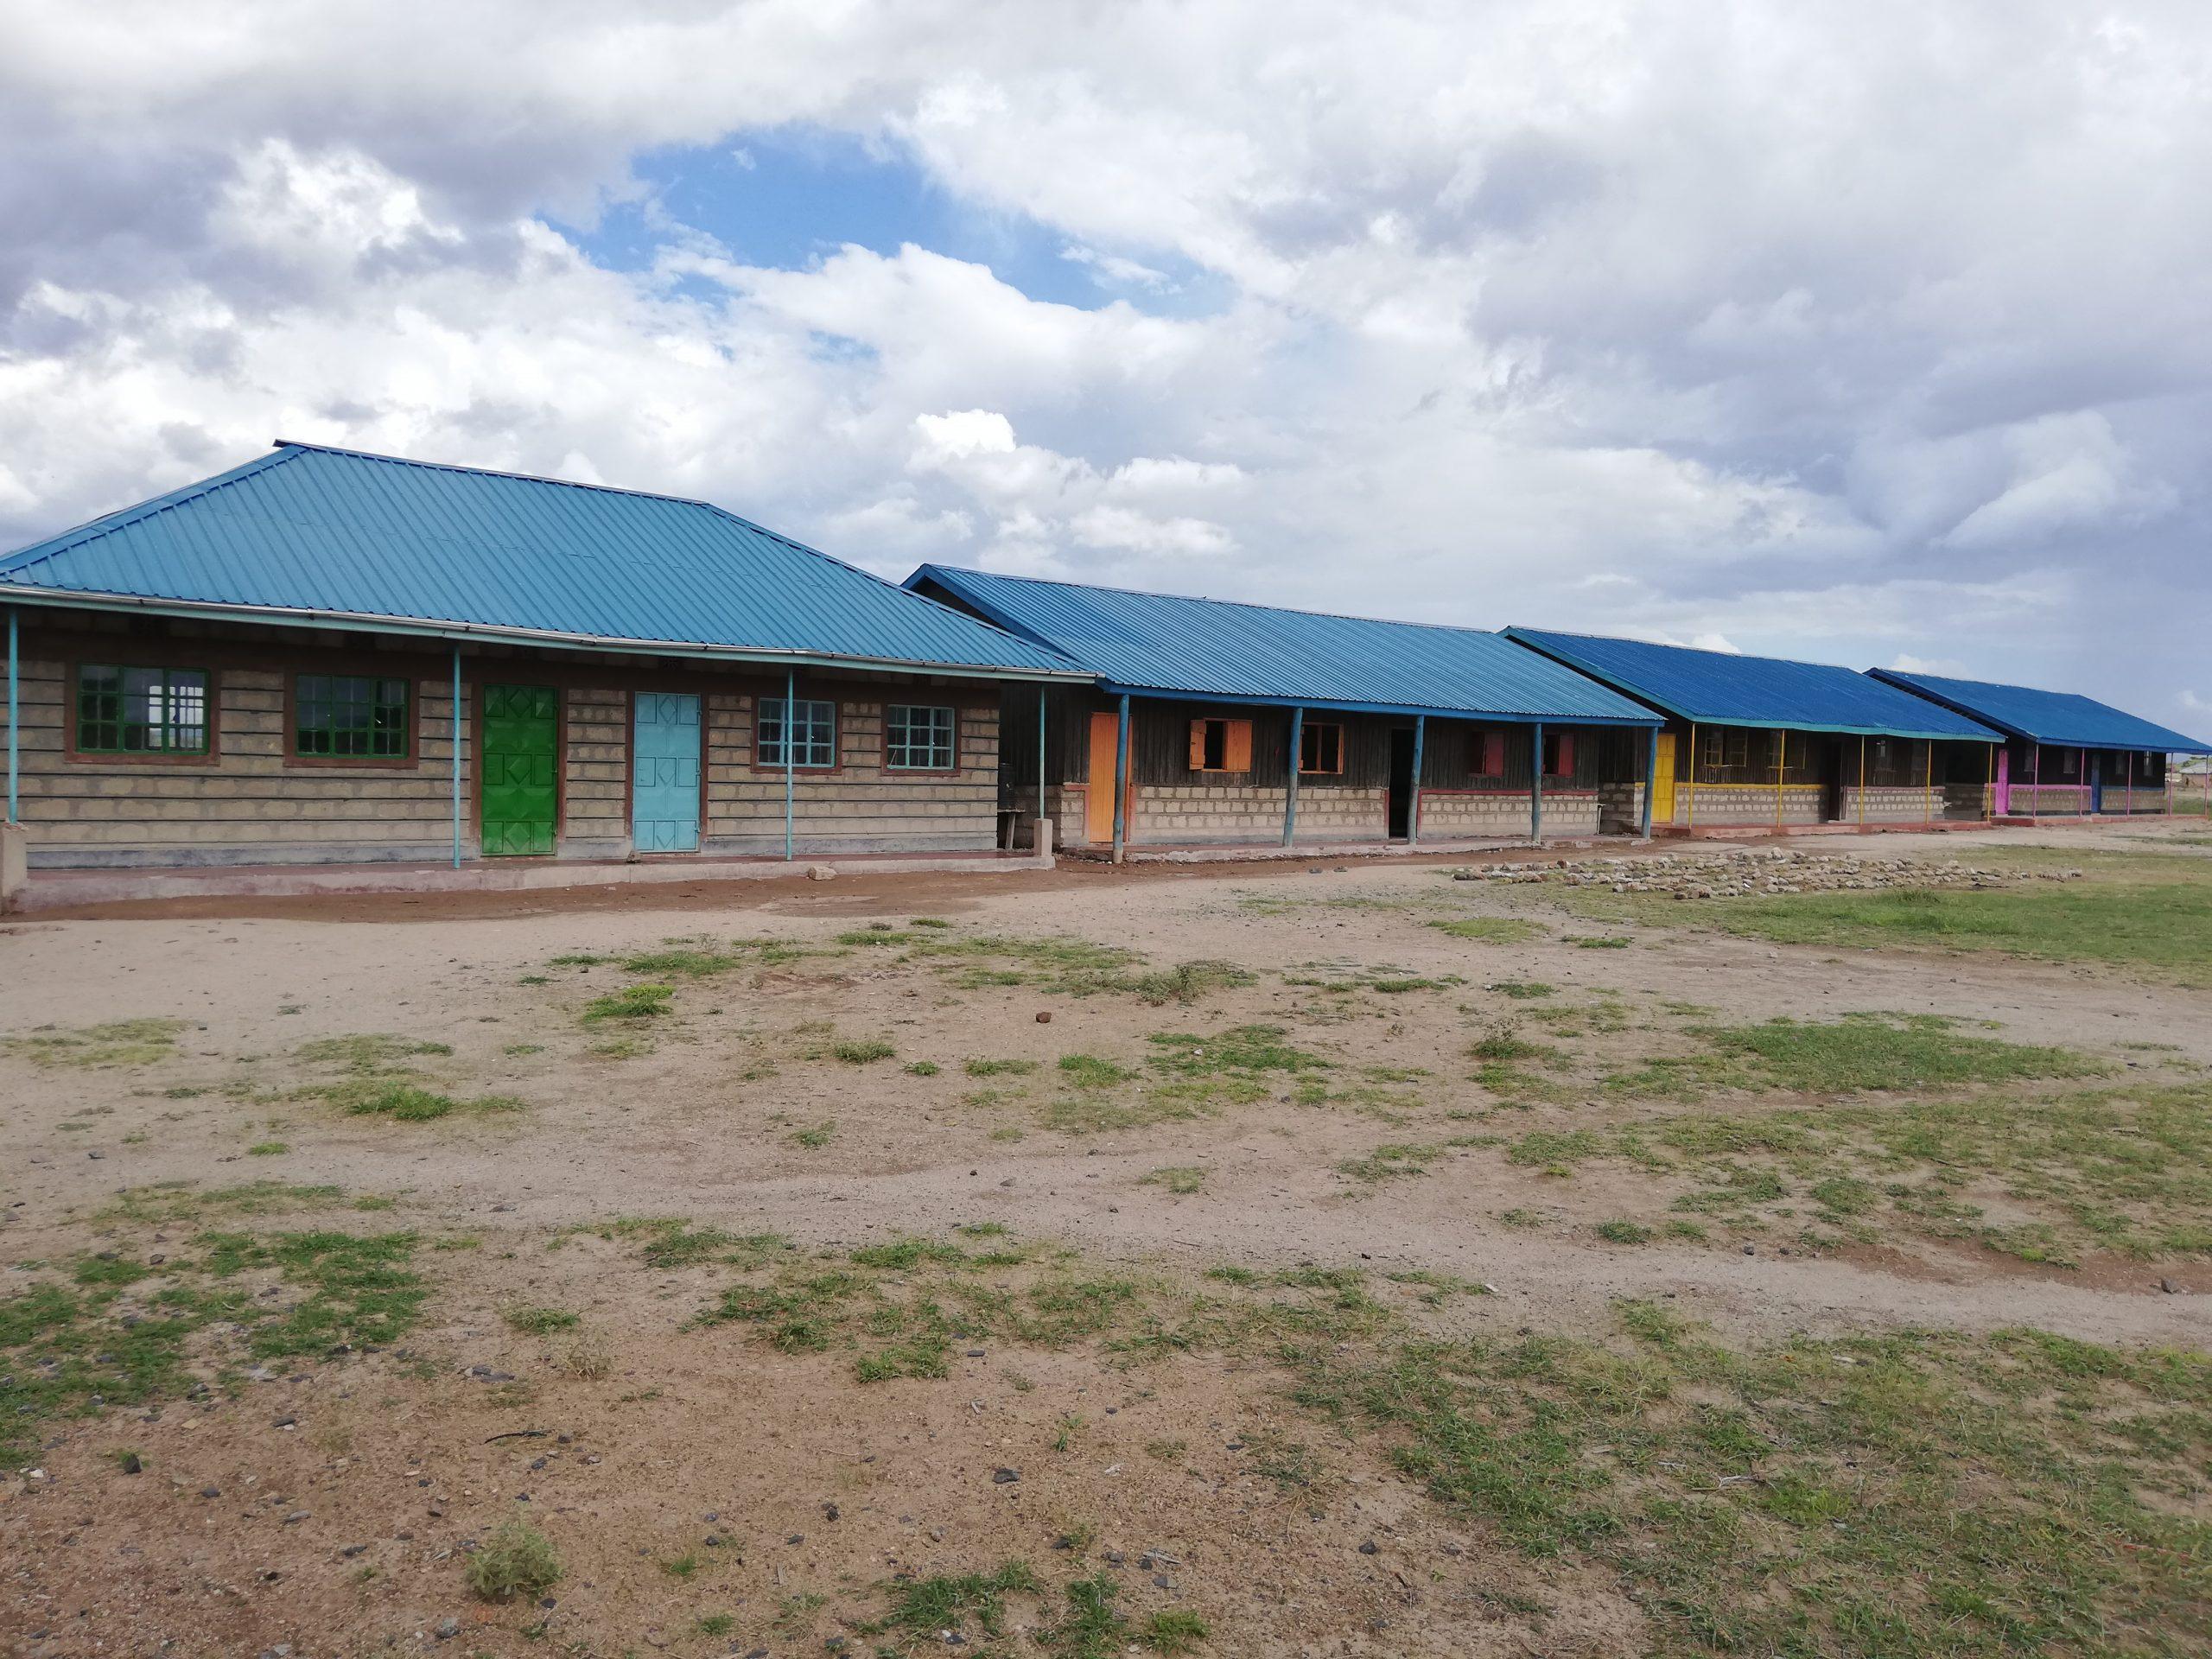 Escuela construida por la ONG IdeaLibre en Chumvi